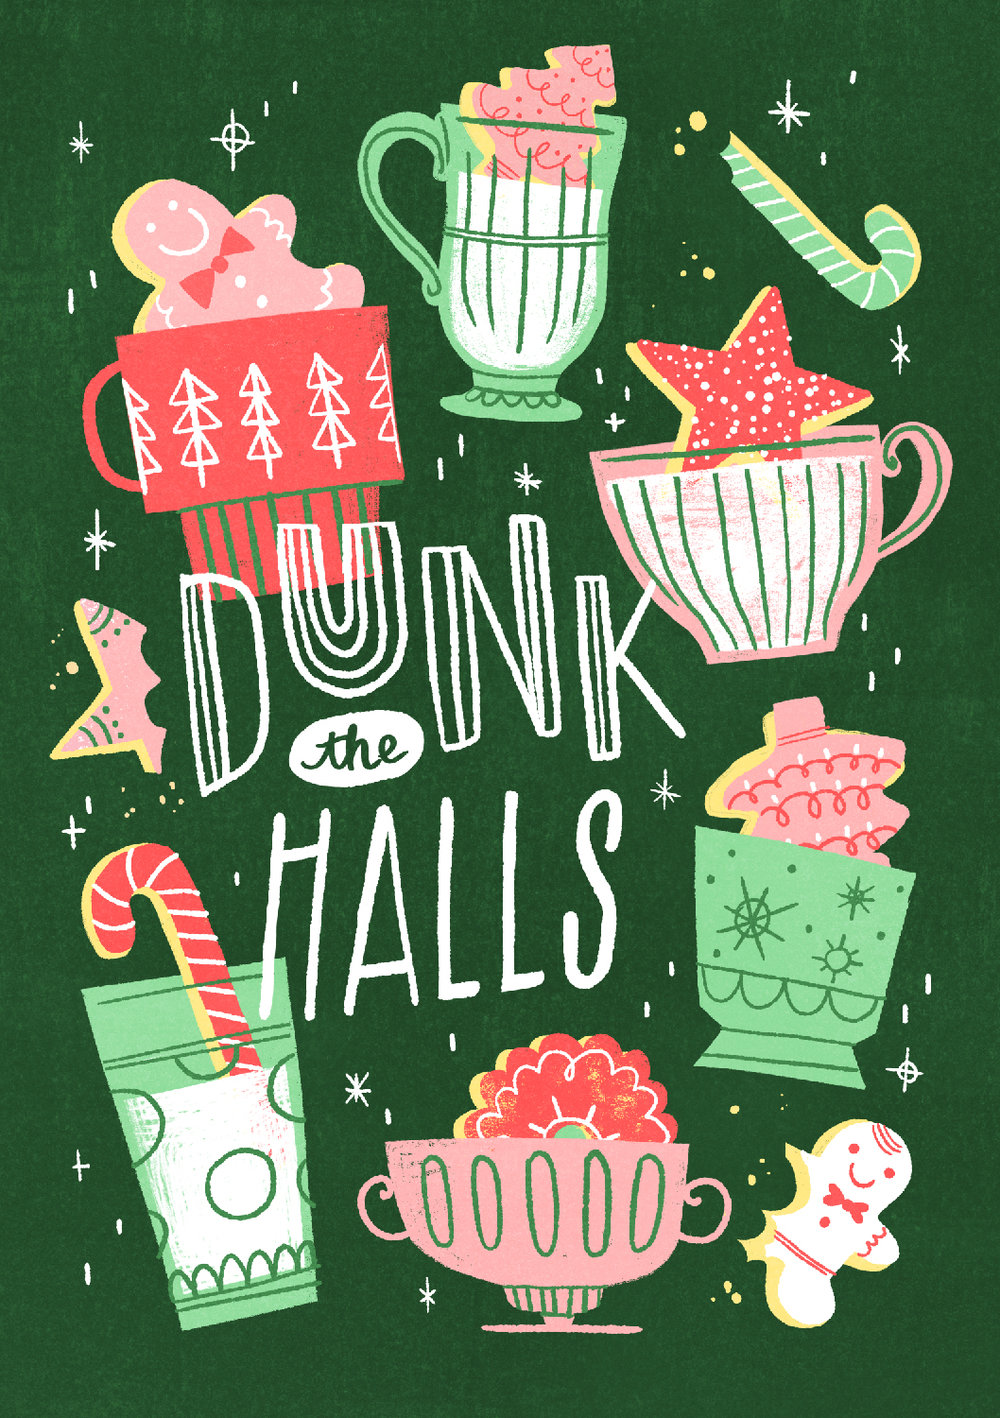 dunk the halls card 1500.jpg